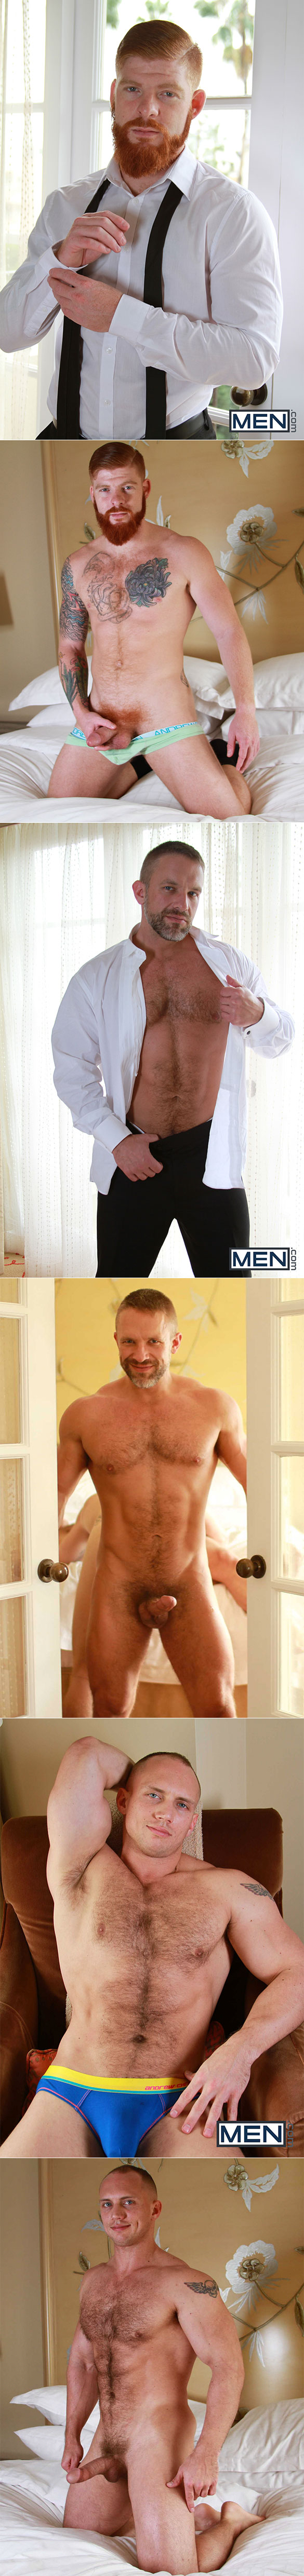 "Men.com: Bennett Anthony and Dirk Caber tag team John Magnum in ""Pretty Boy, Part 3"""